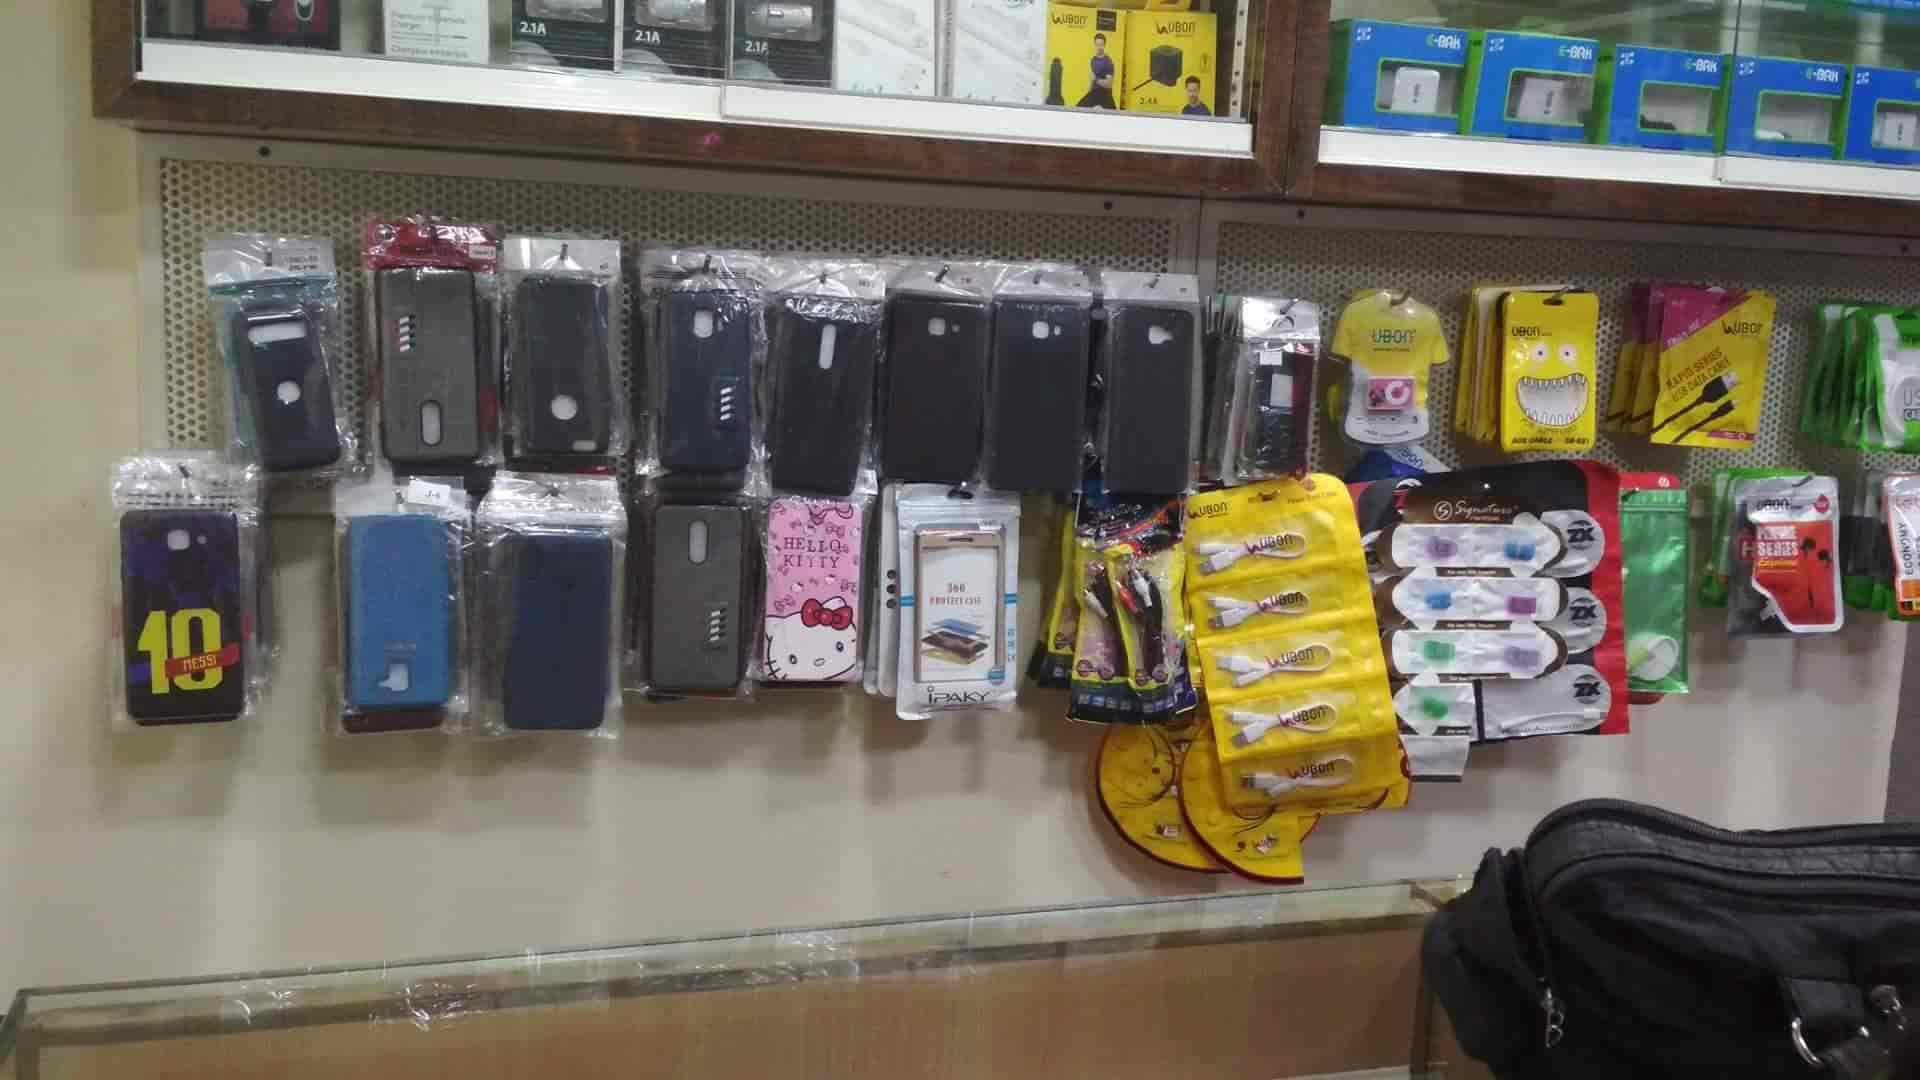 Shree Mahalaxmi Mobile Shopee Photos Rk Nagar Kolhapur Pictures